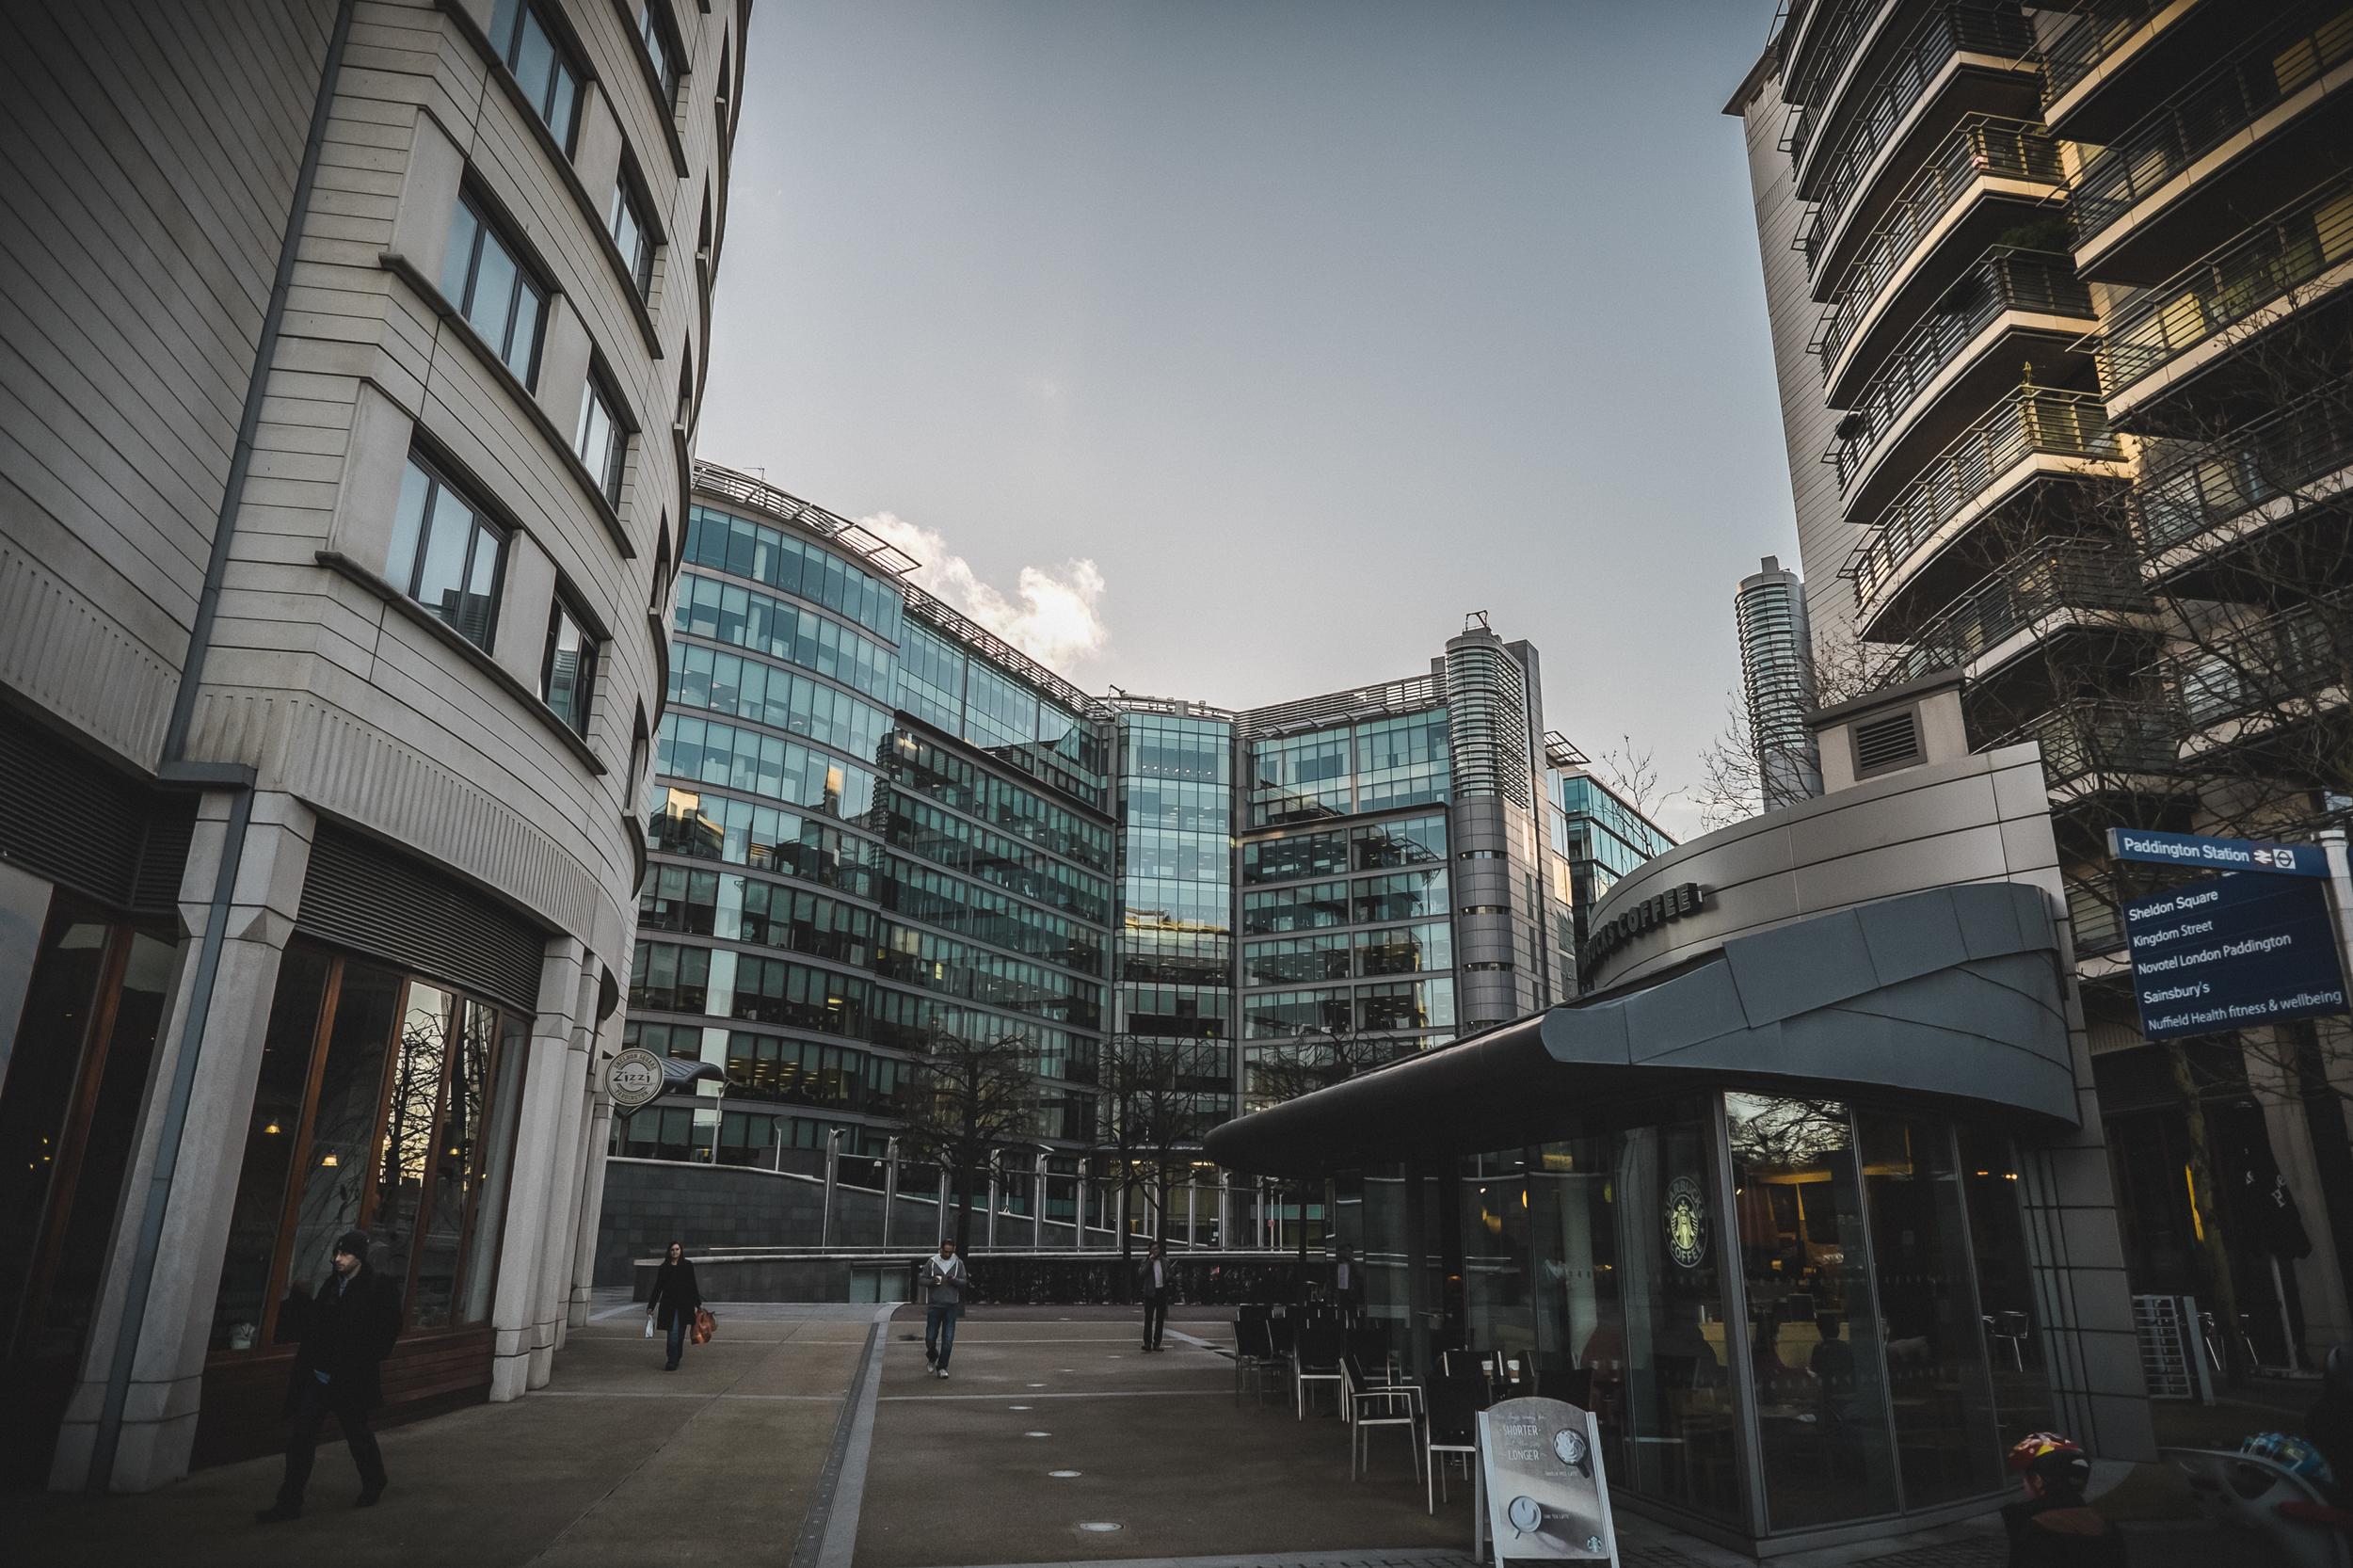 London Fuji Photowalk | Fuji XE2 | 14mm - F2.8 - 1/800th - iso800